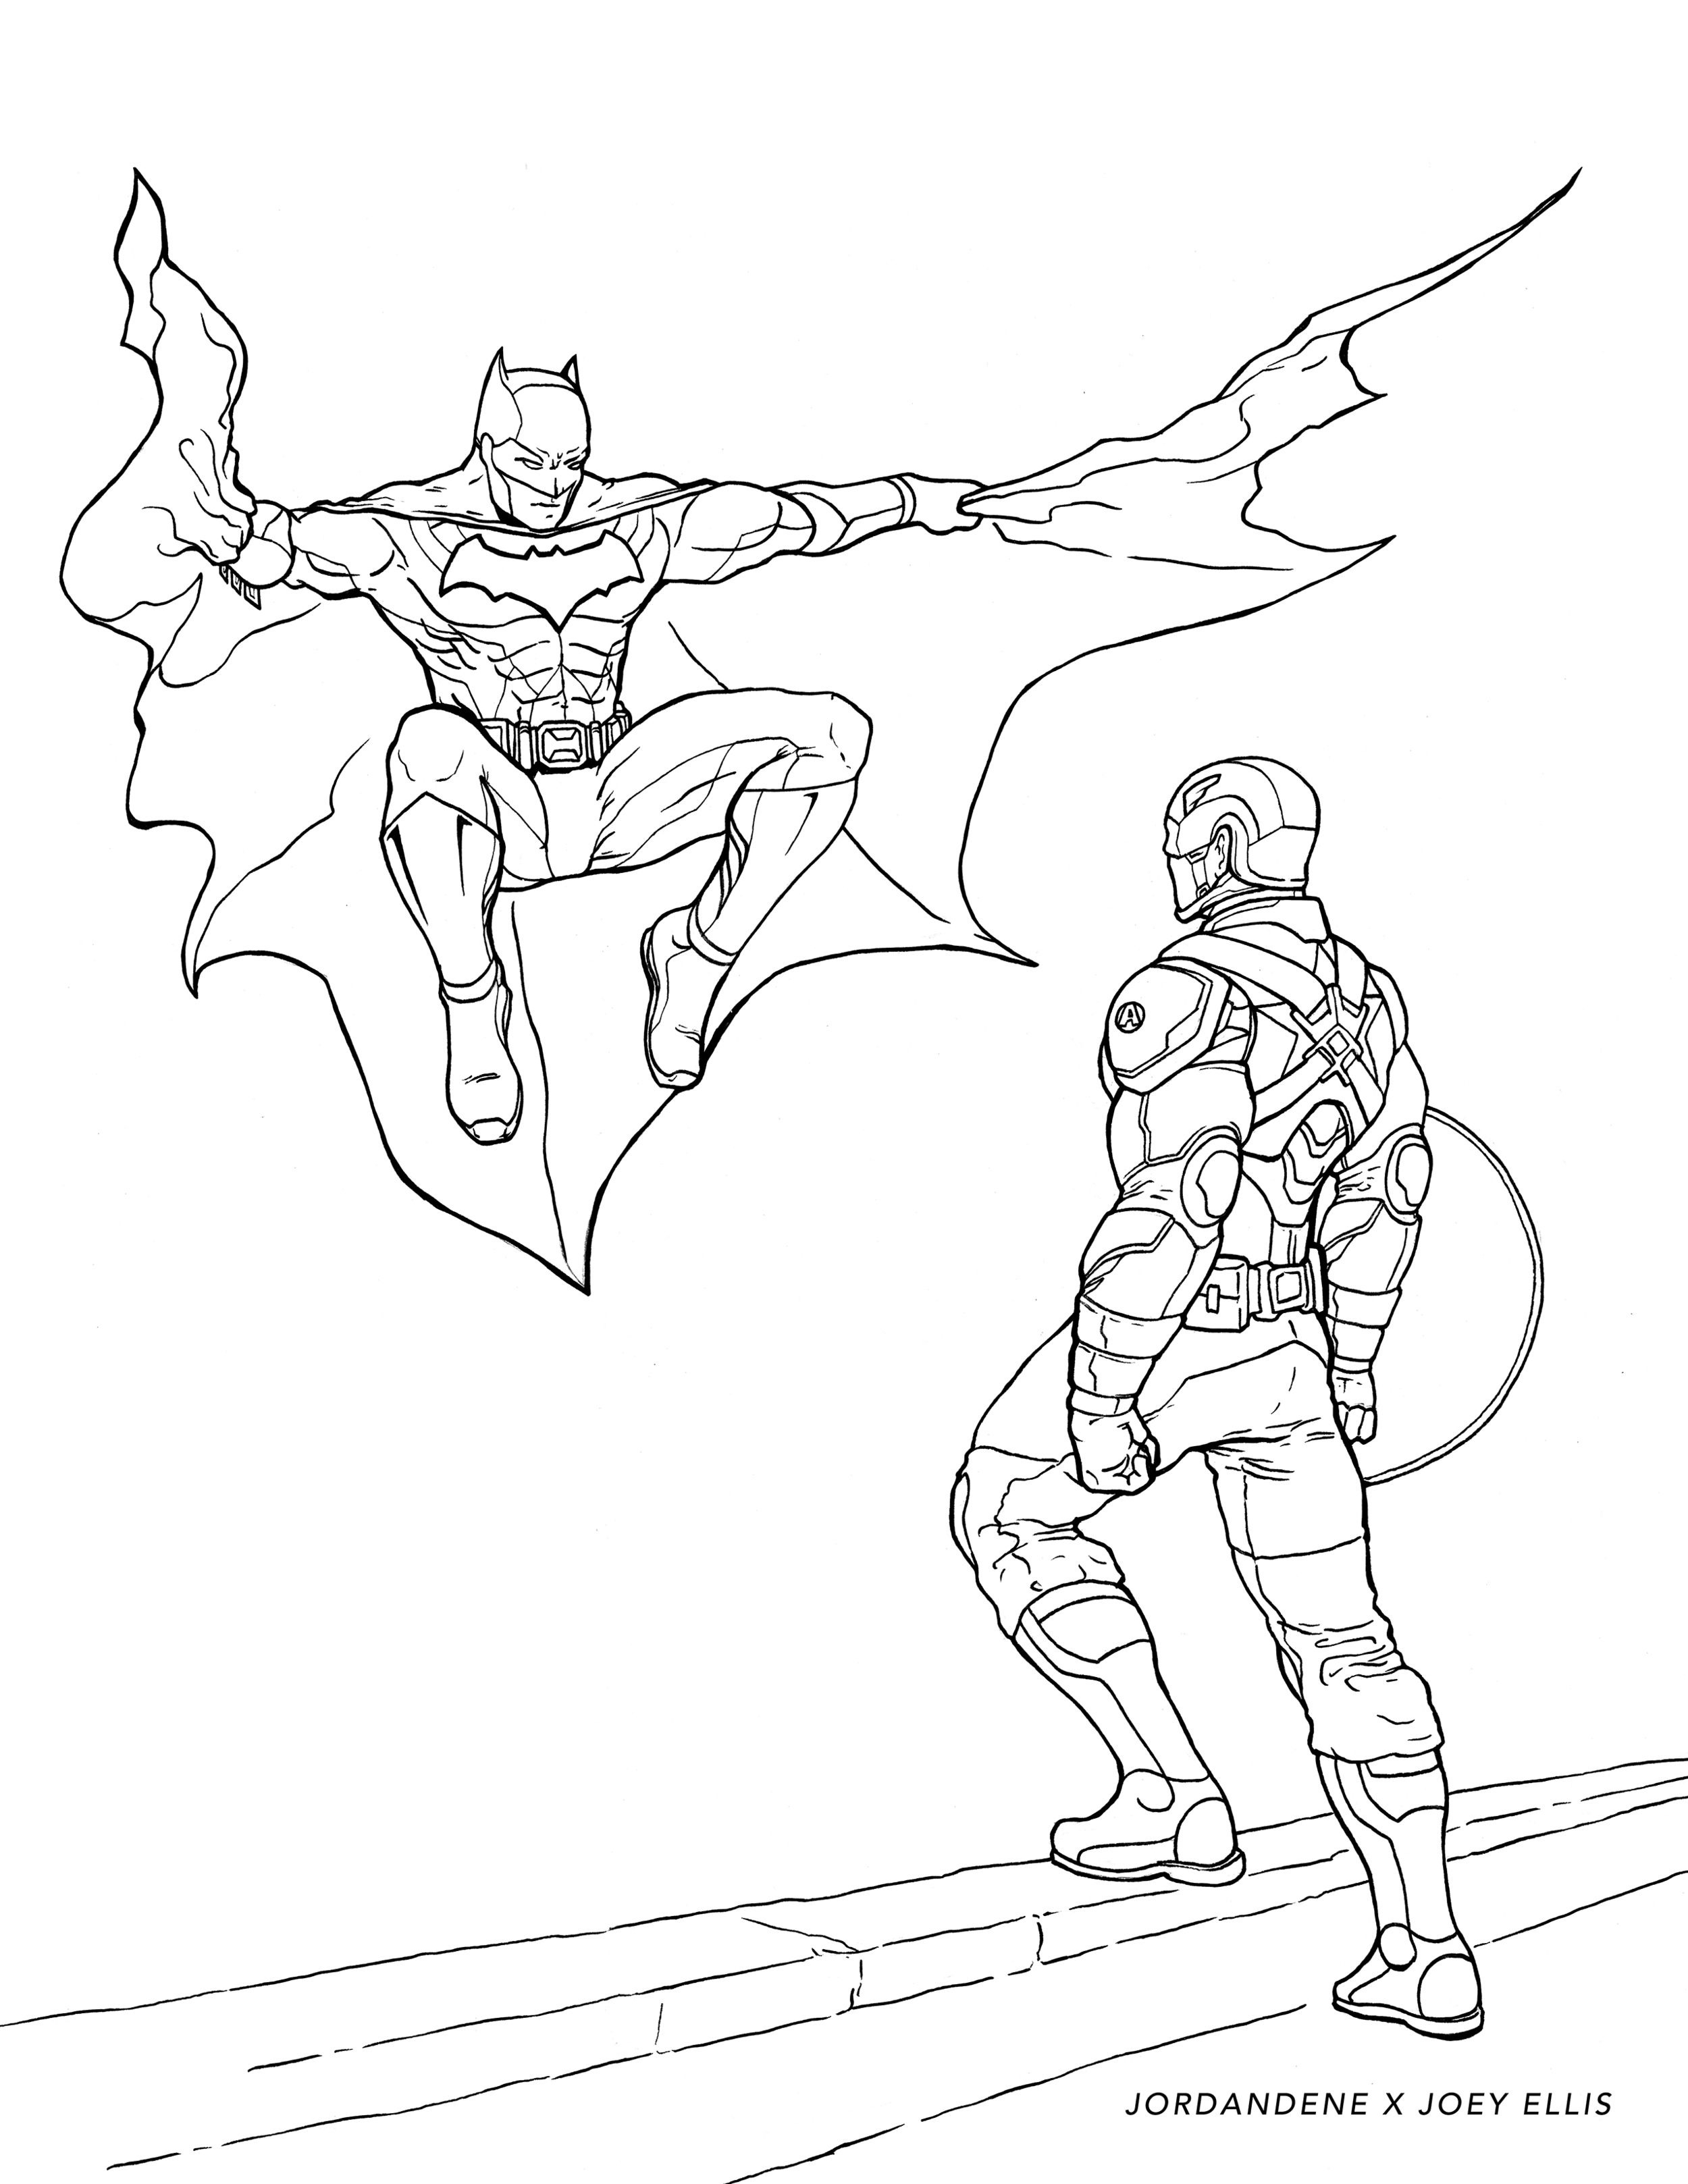 Printable Coloring Page Batman Vs Captain America Batman Coloring Pages Captain America Coloring Pages Free Coloring Pages